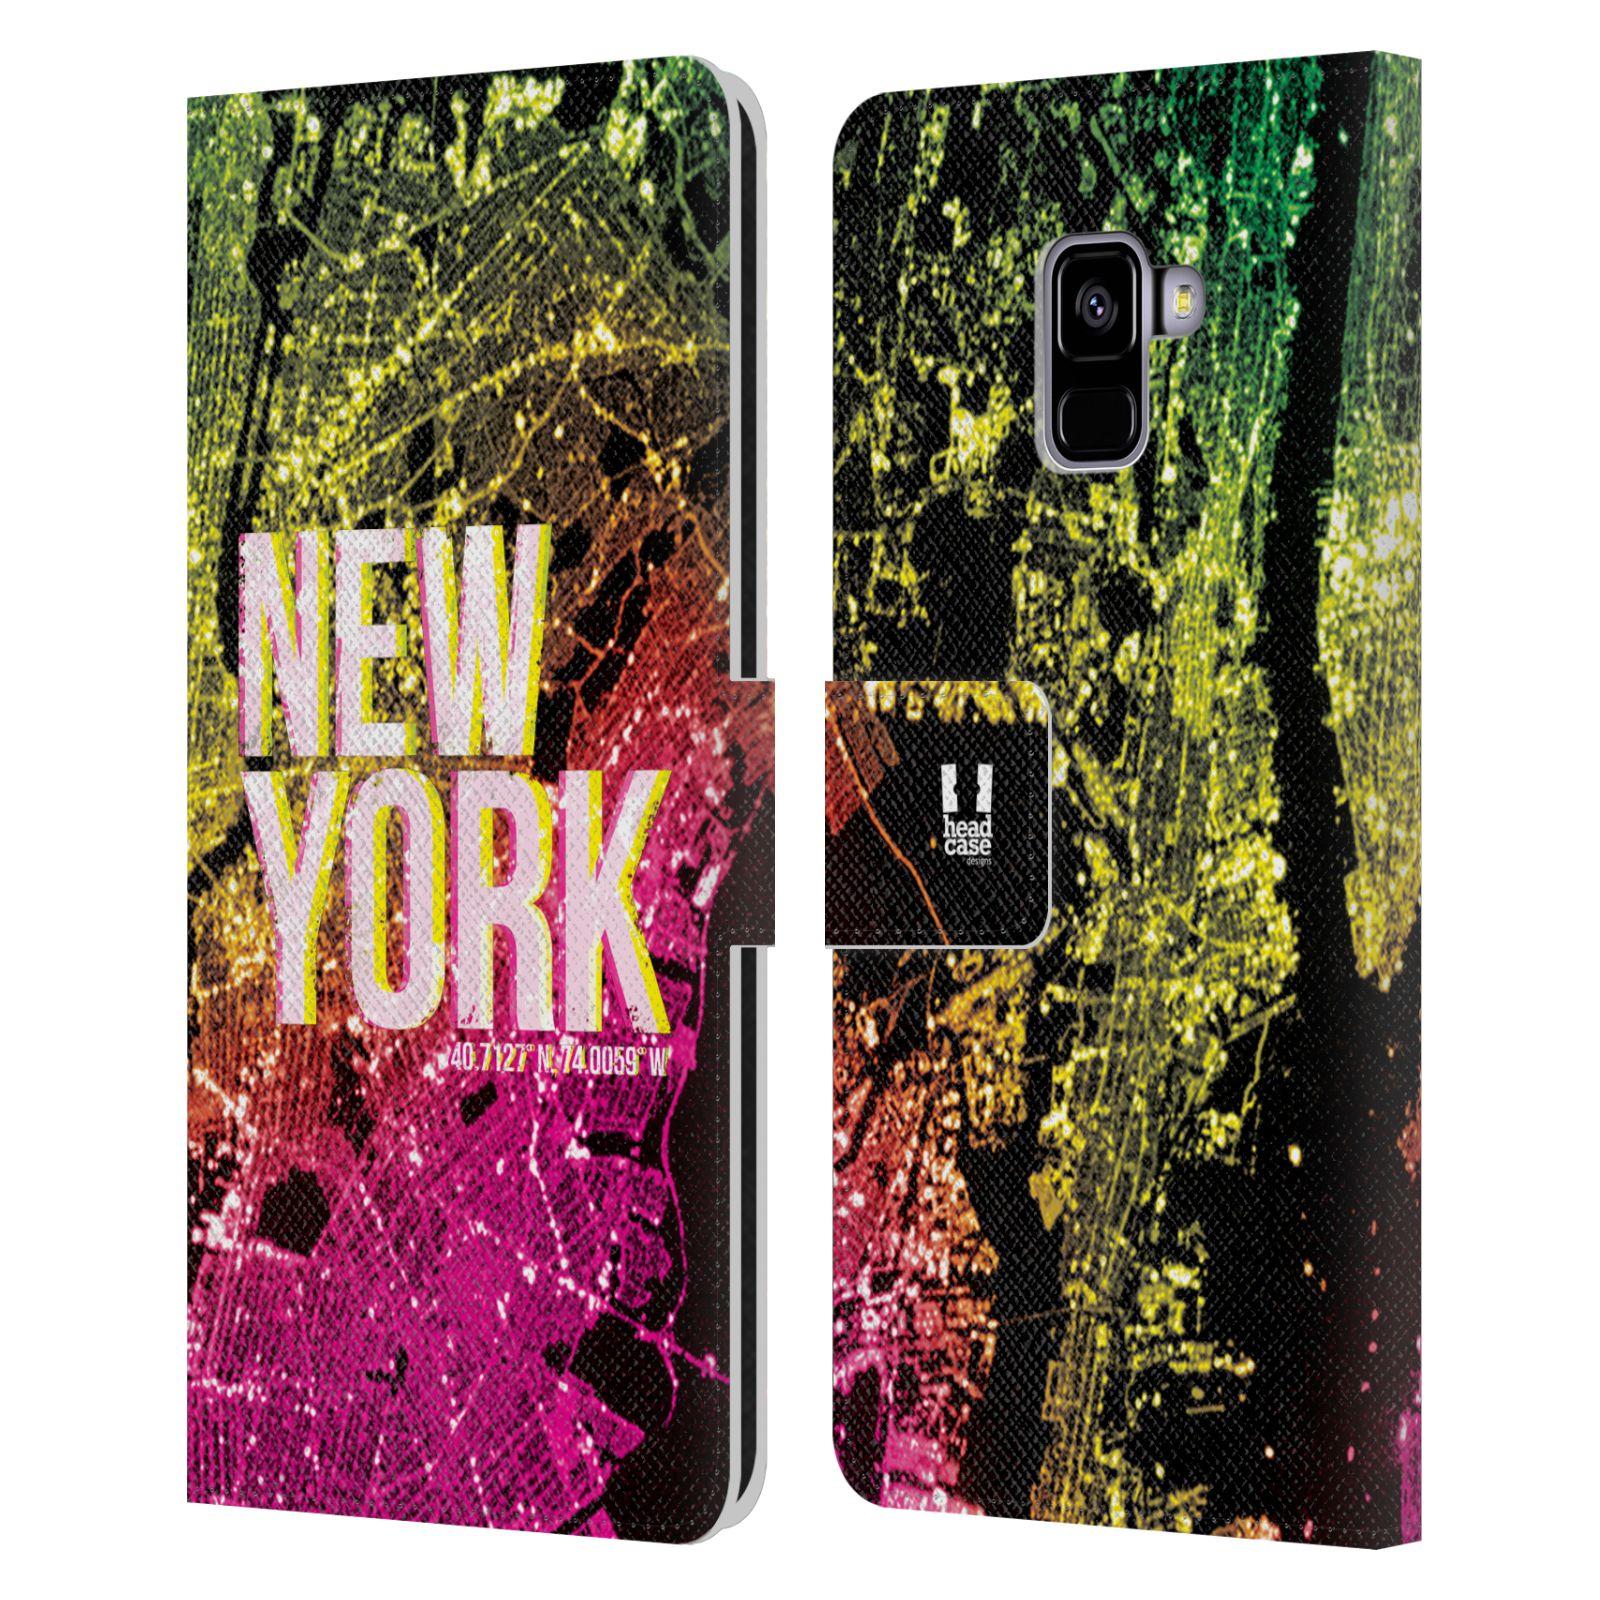 Pouzdro na mobil Samsung Galaxy A8 PLUS 2018 - Head Case - NEW YORK pohled z vesmíru